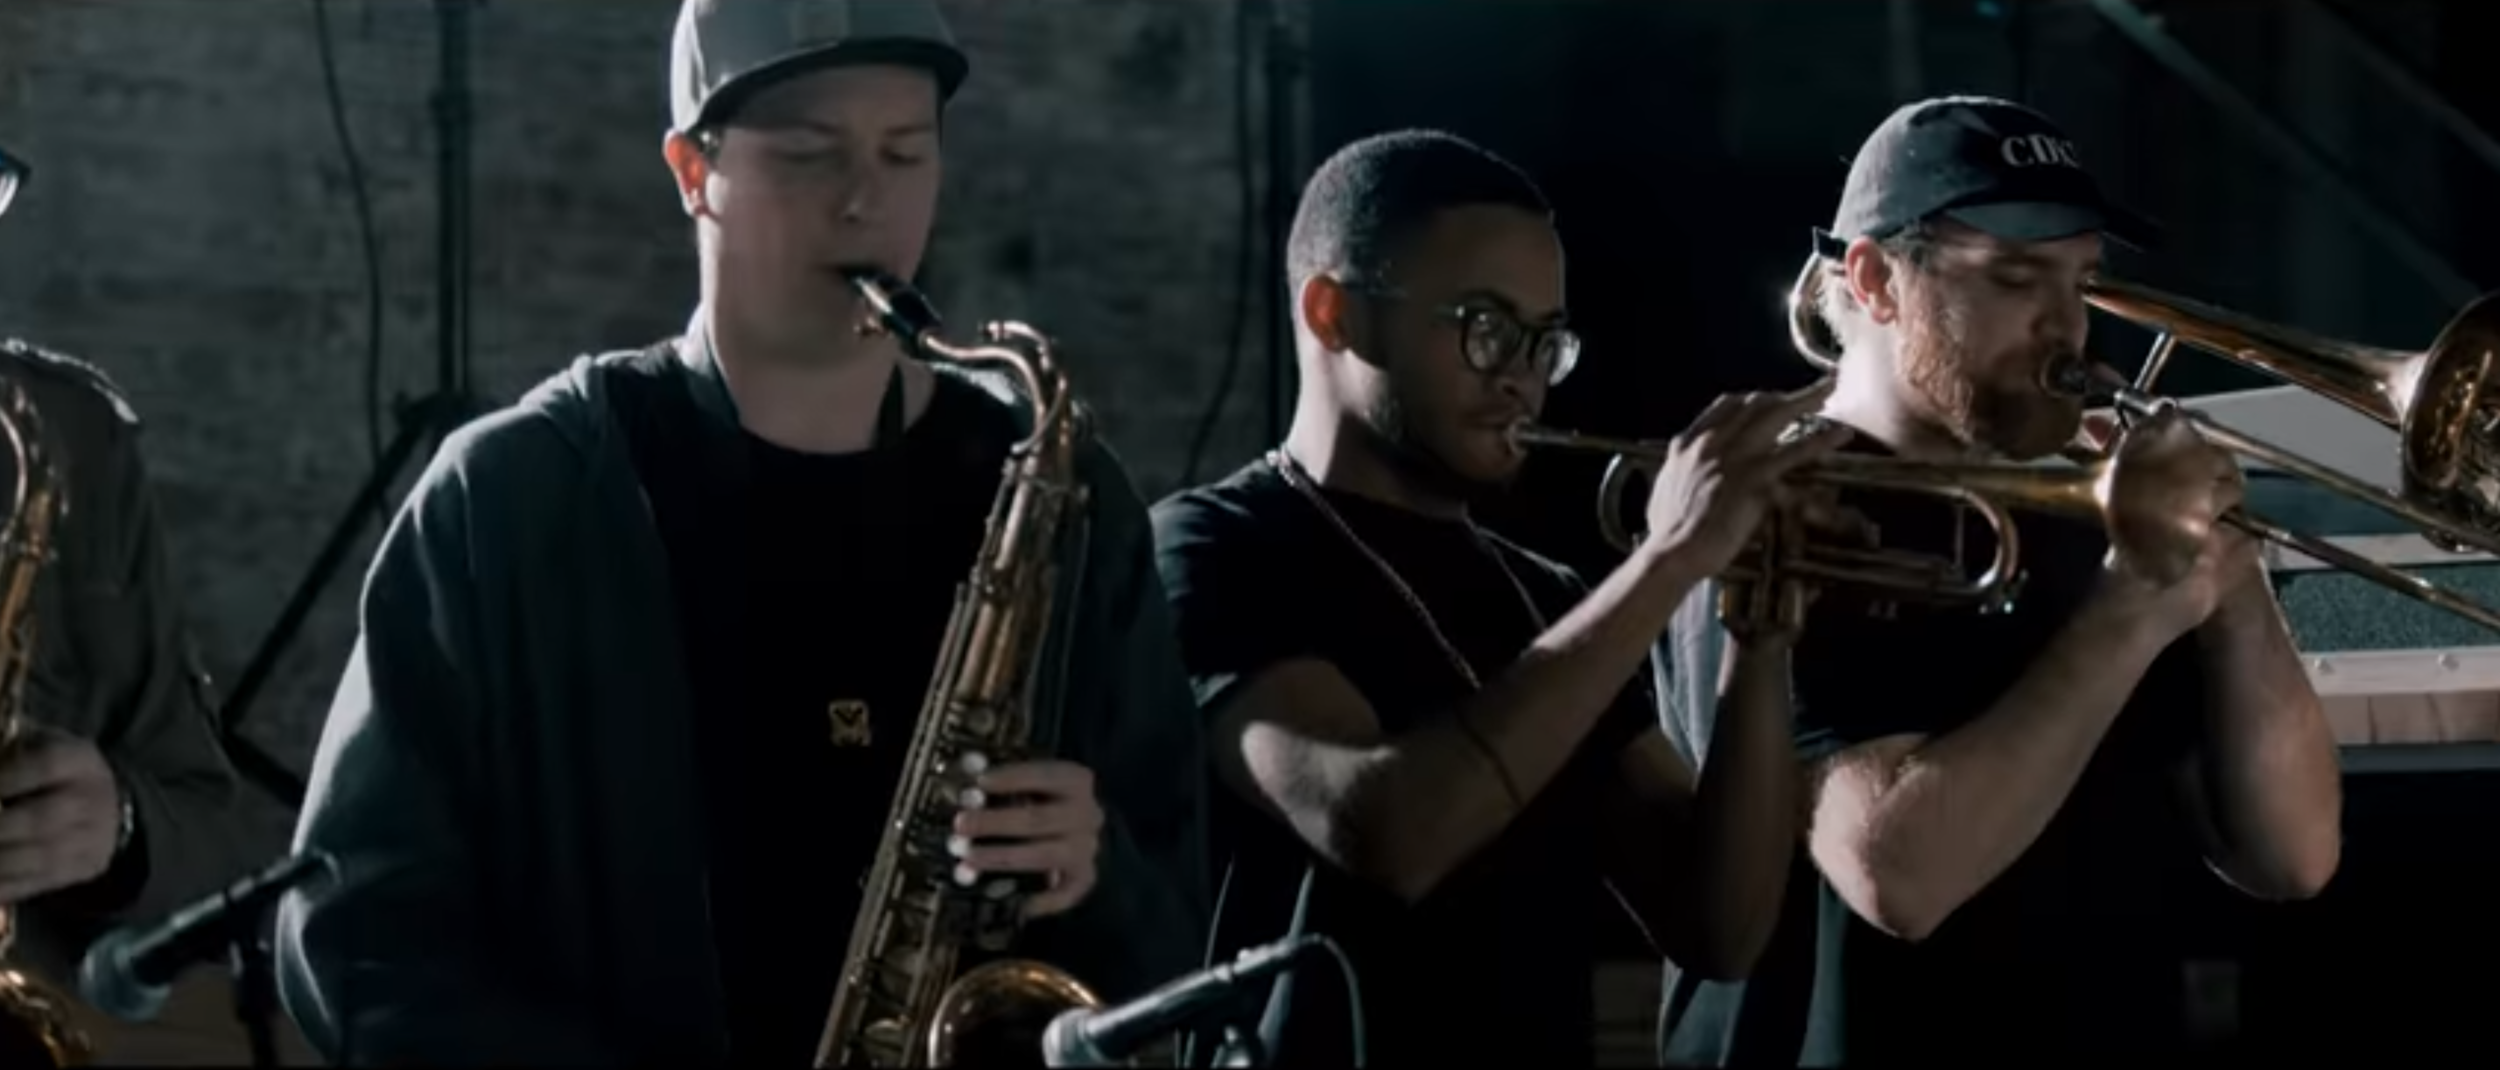 Blue Pools music video